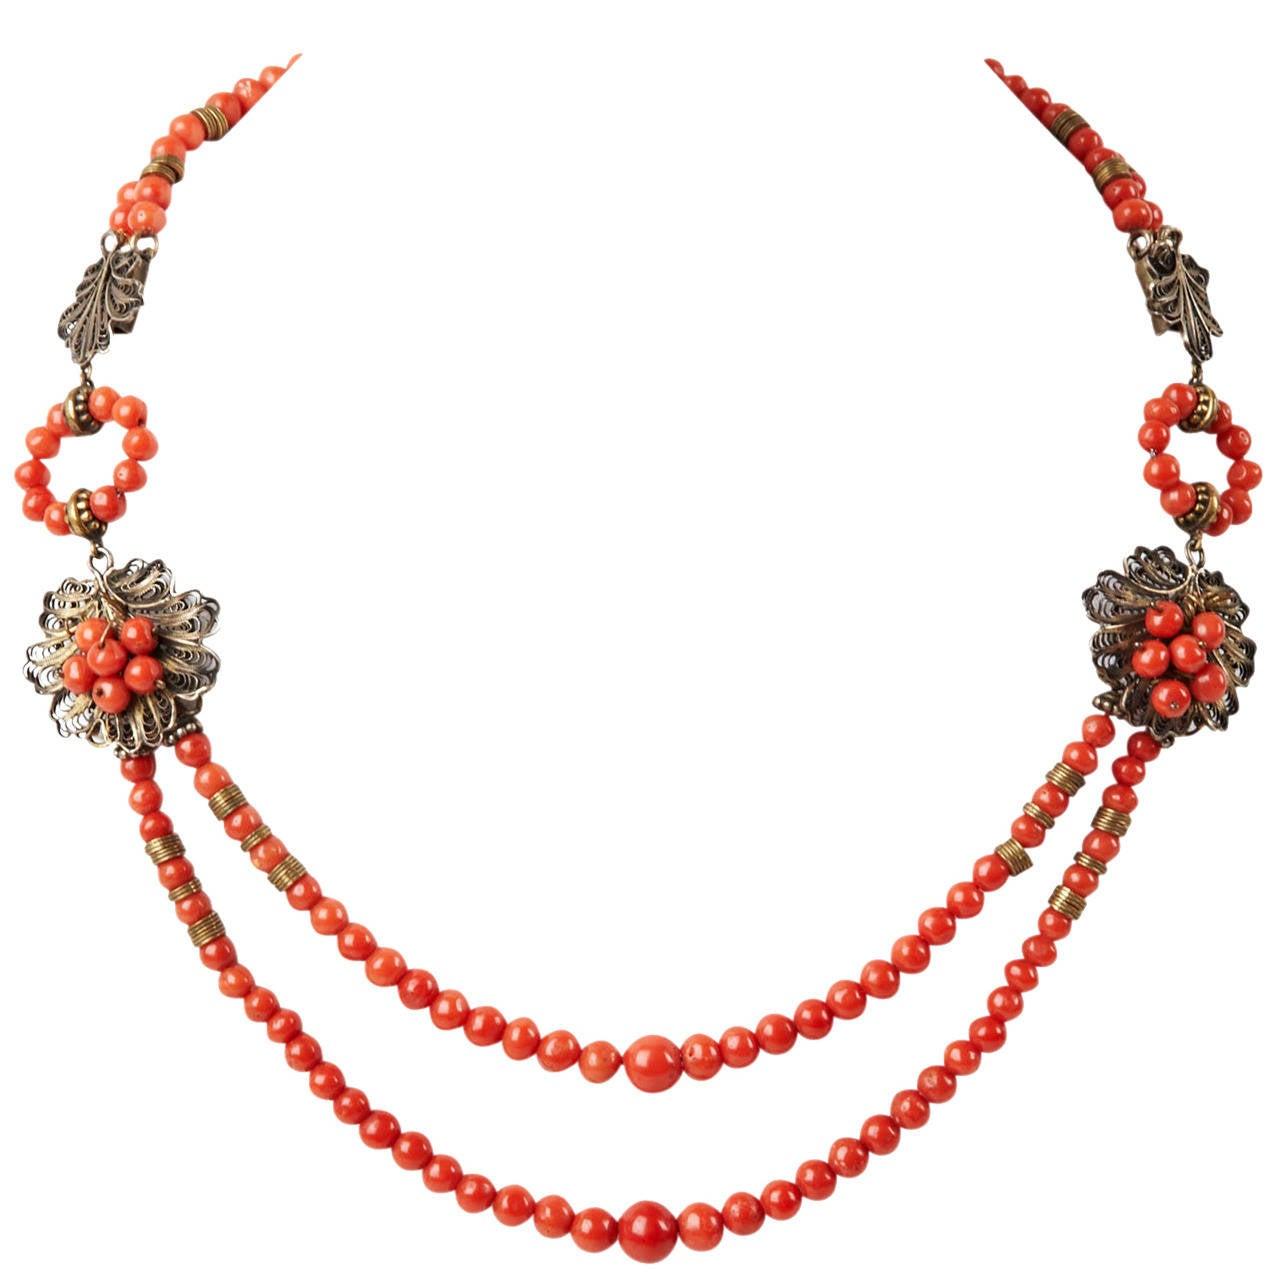 Antique Coral Filigree Necklace 1